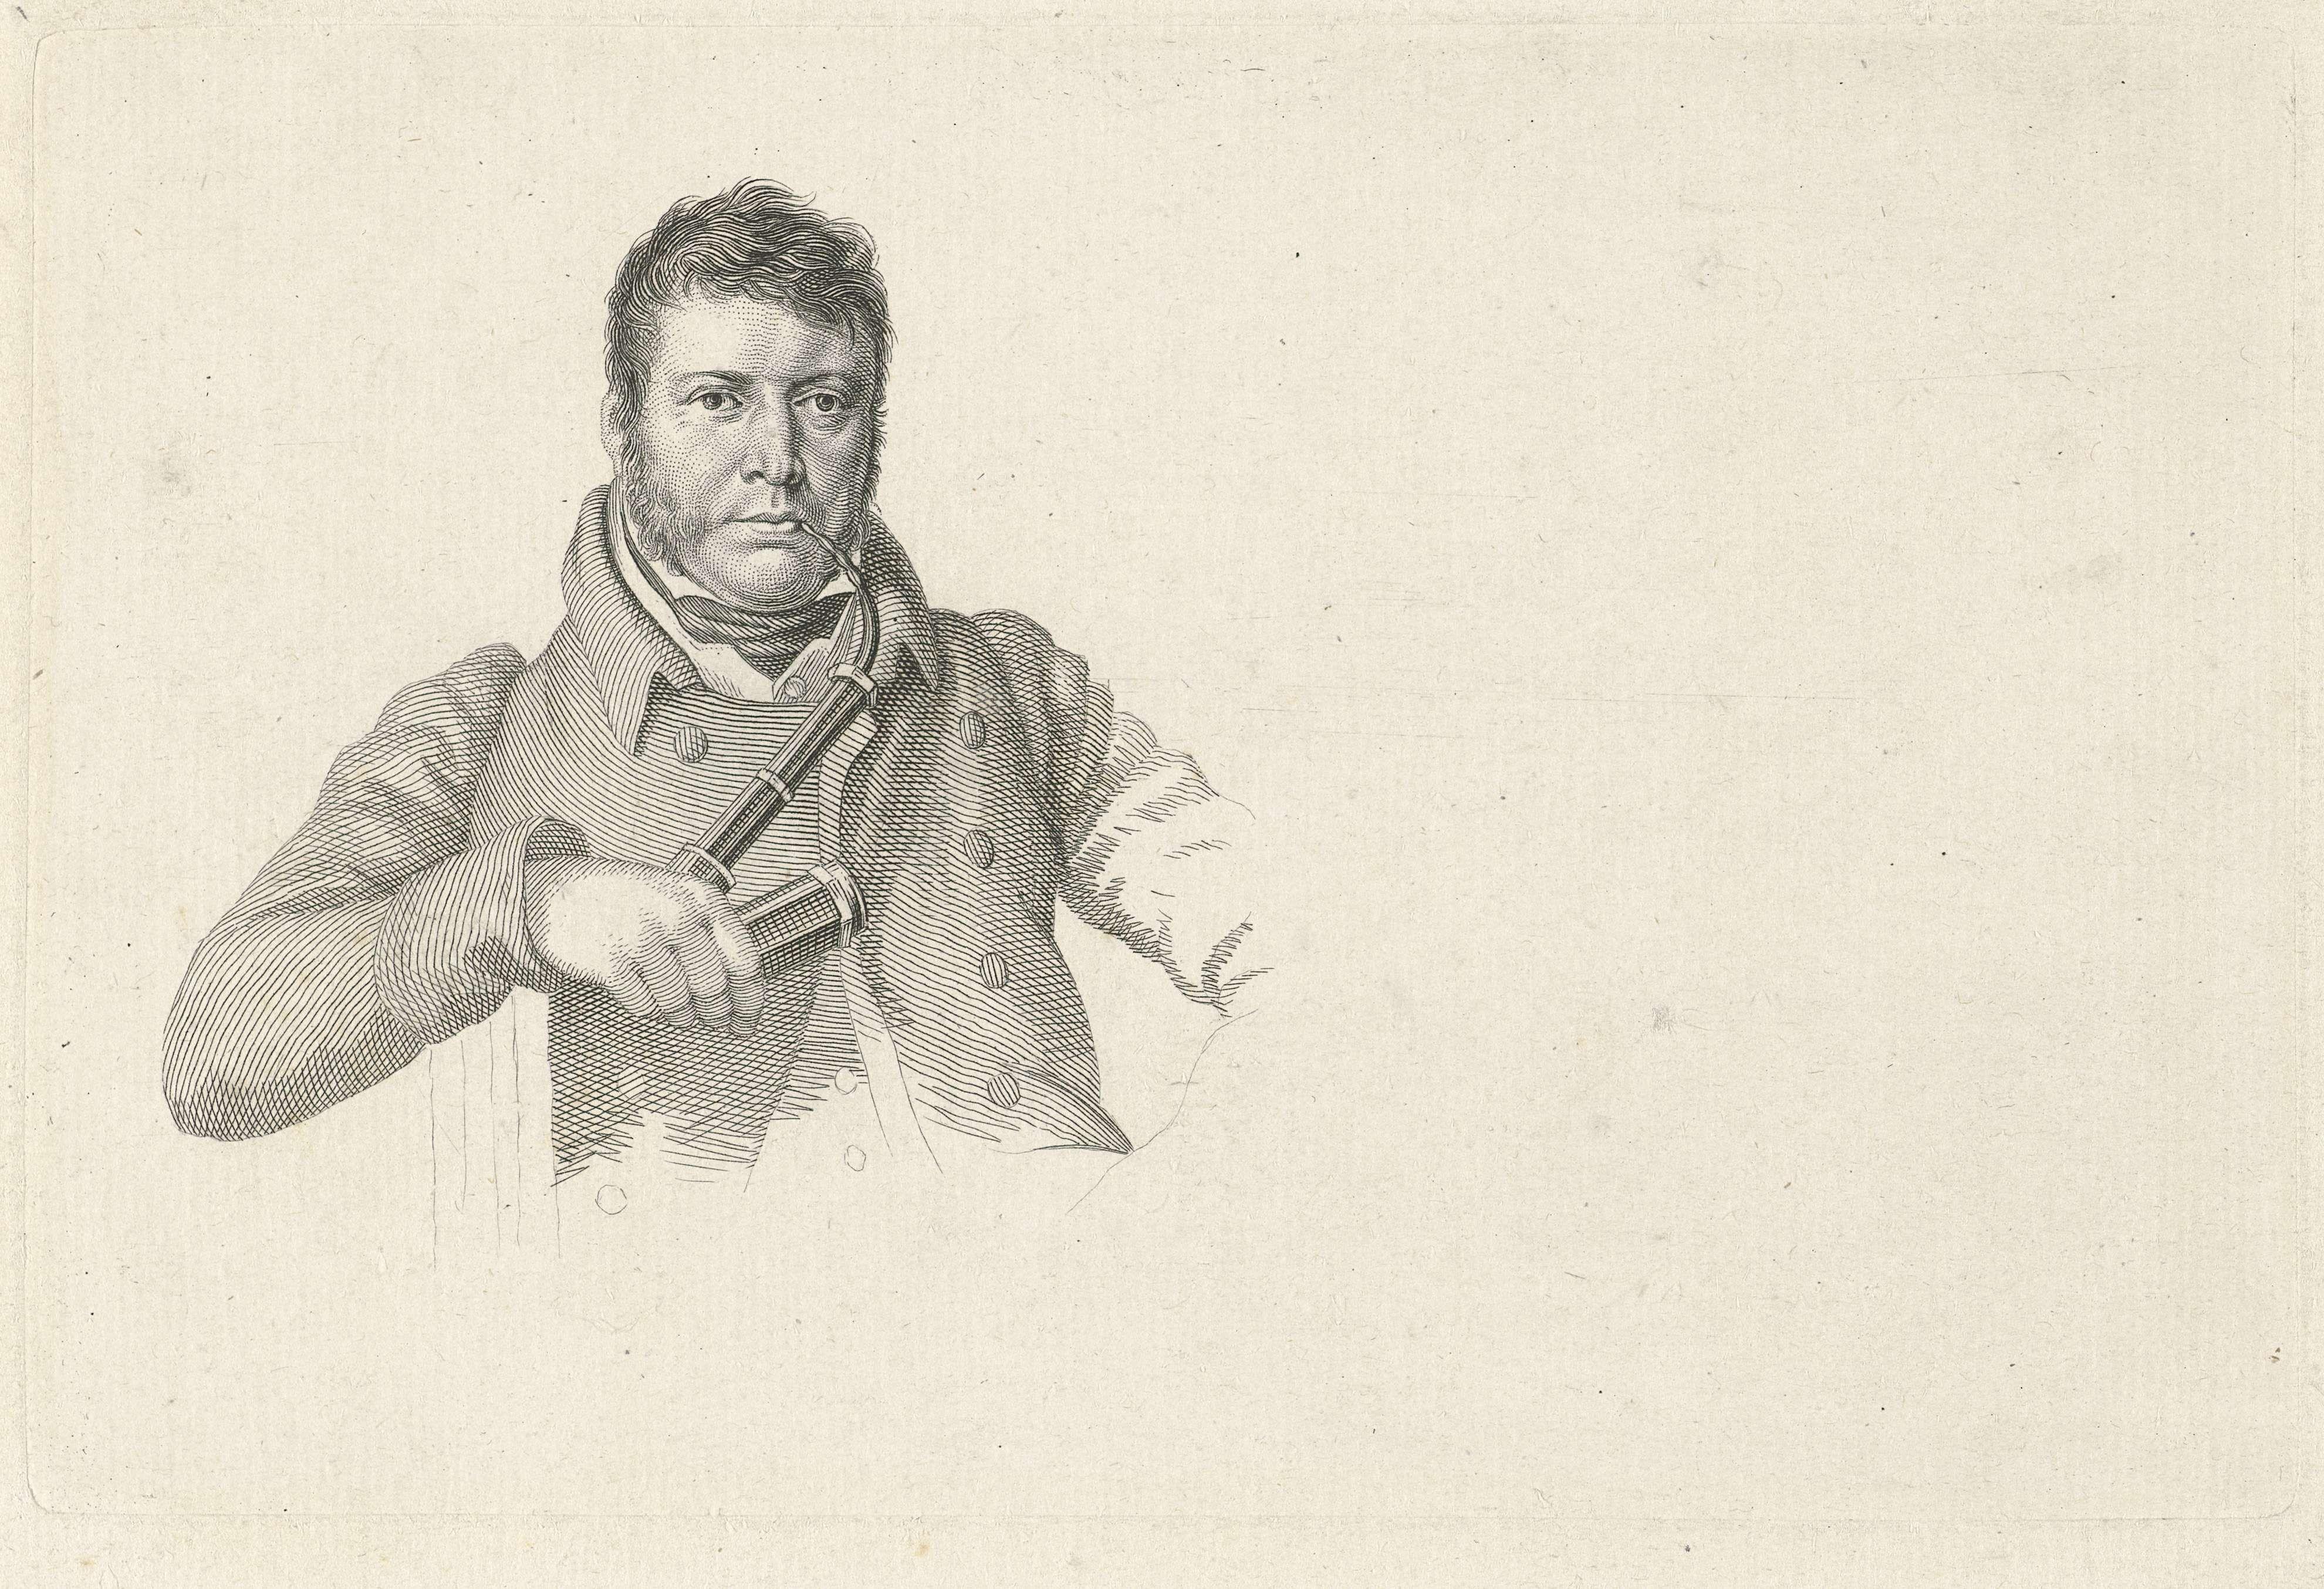 Jacob Ernst Marcus | Portret van Pieter Gerardus van Os, Jacob Ernst Marcus, Hendrik Willem Caspari, 1816 | Portret van de schilder Pieter Gerardus van Os met pijp.